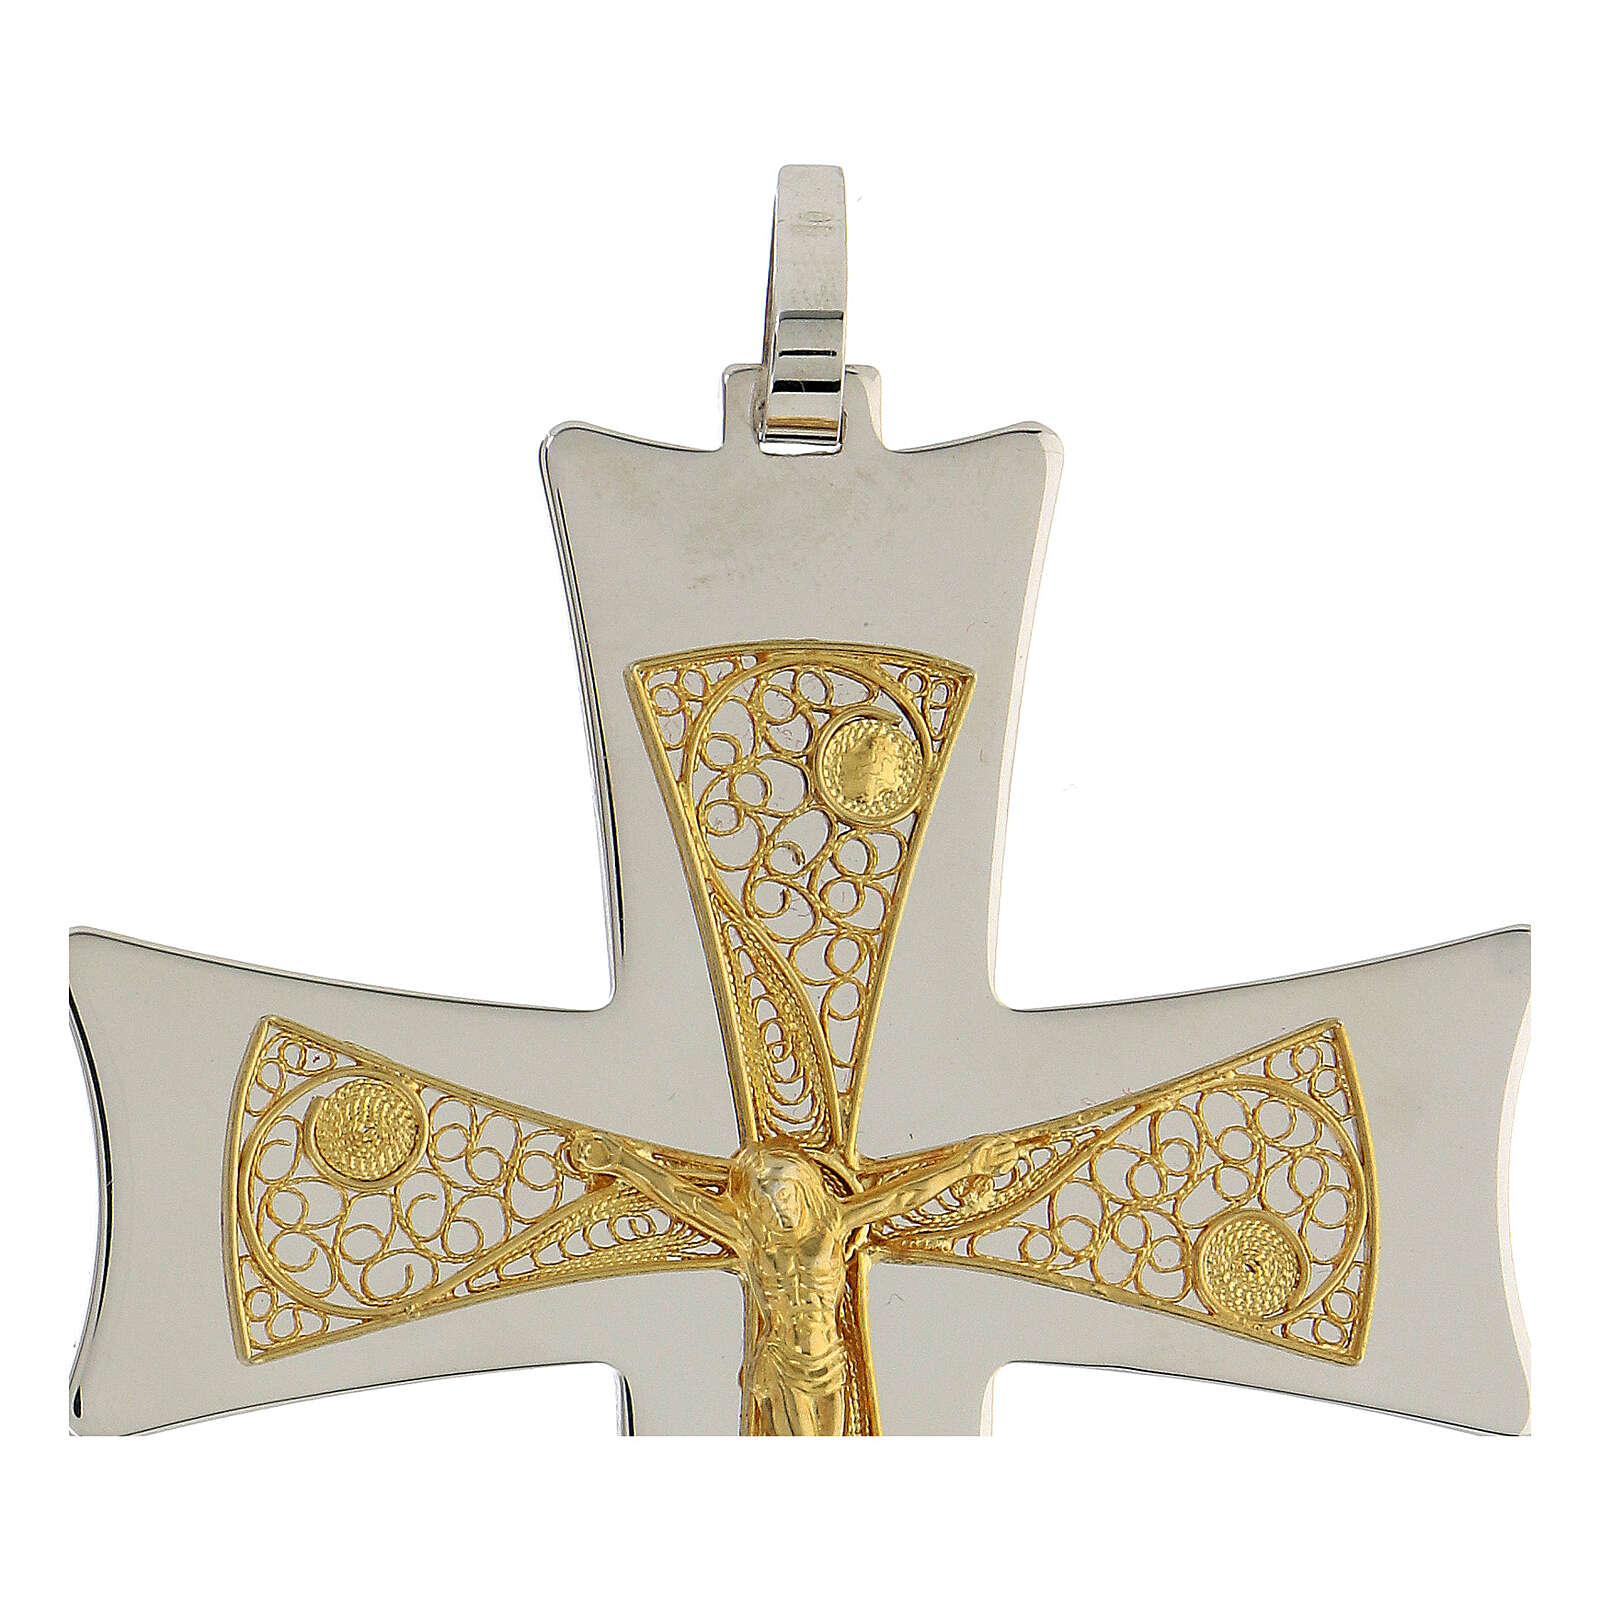 Cruz obispo plata 925 bicolor filigrana dorada 9,5x6,5 cm 3